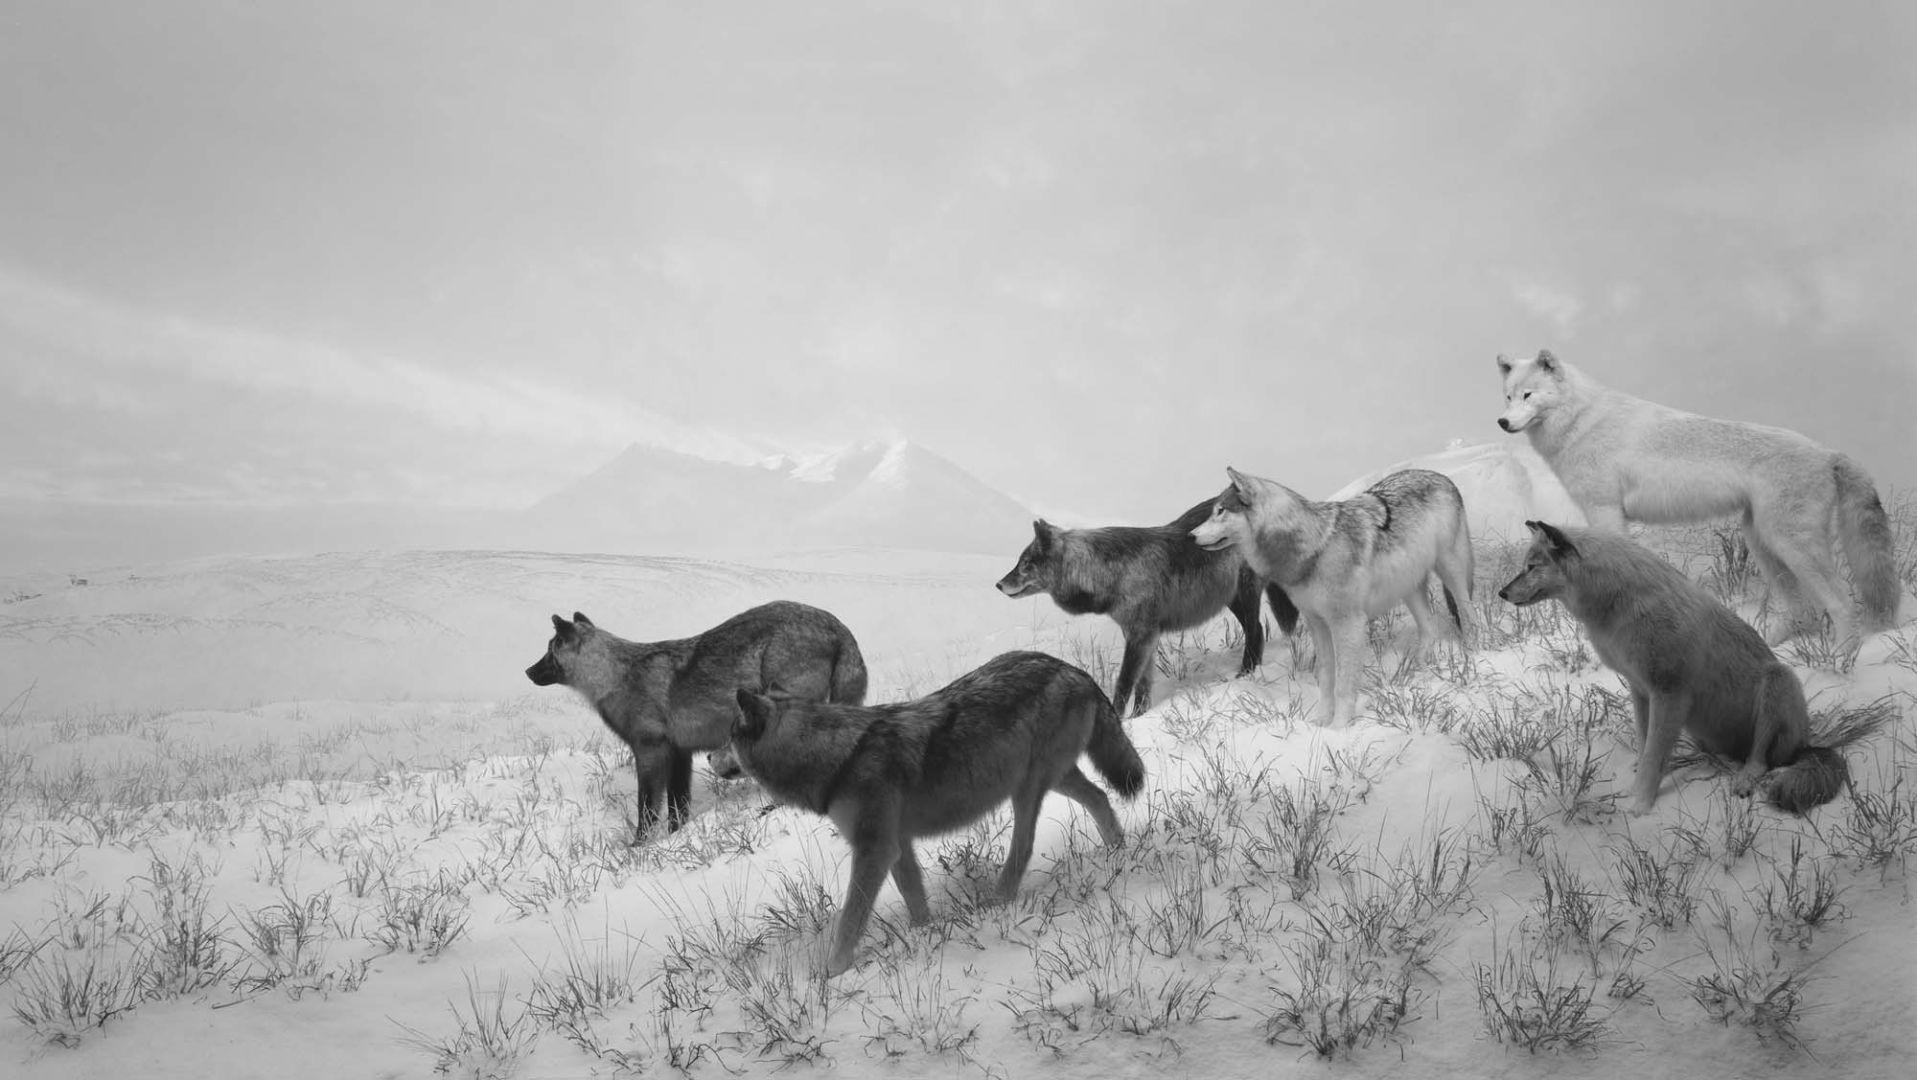 Alaskan Wolves – Hiroshi Sugimoto, Japan, Animal, Landscape, black and white